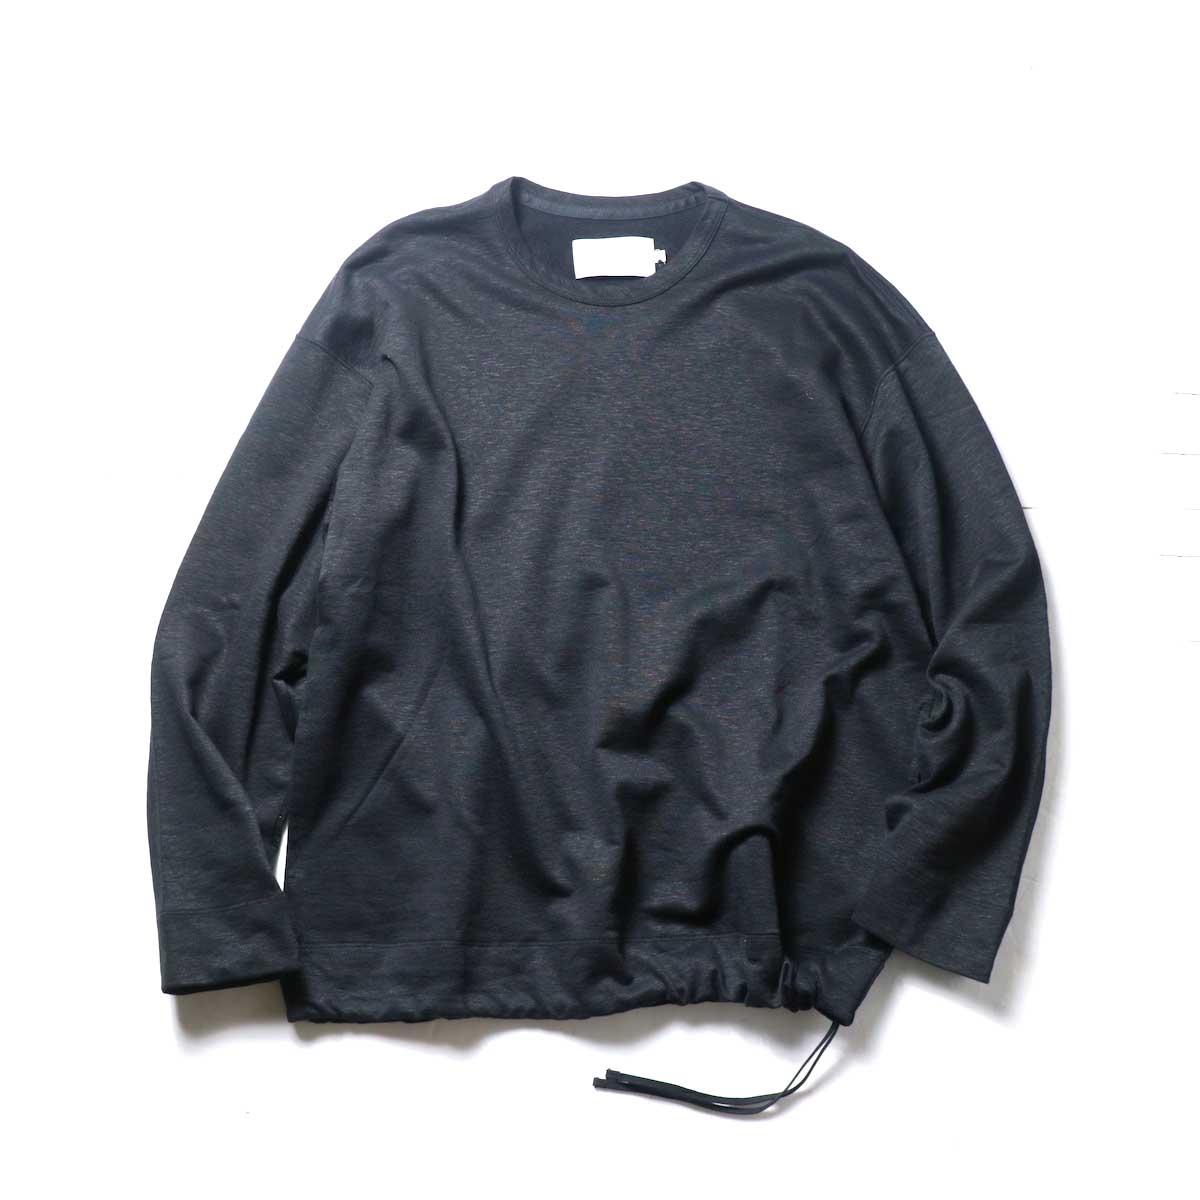 CURLY / CLOUDY CREW SWEAT (Black)